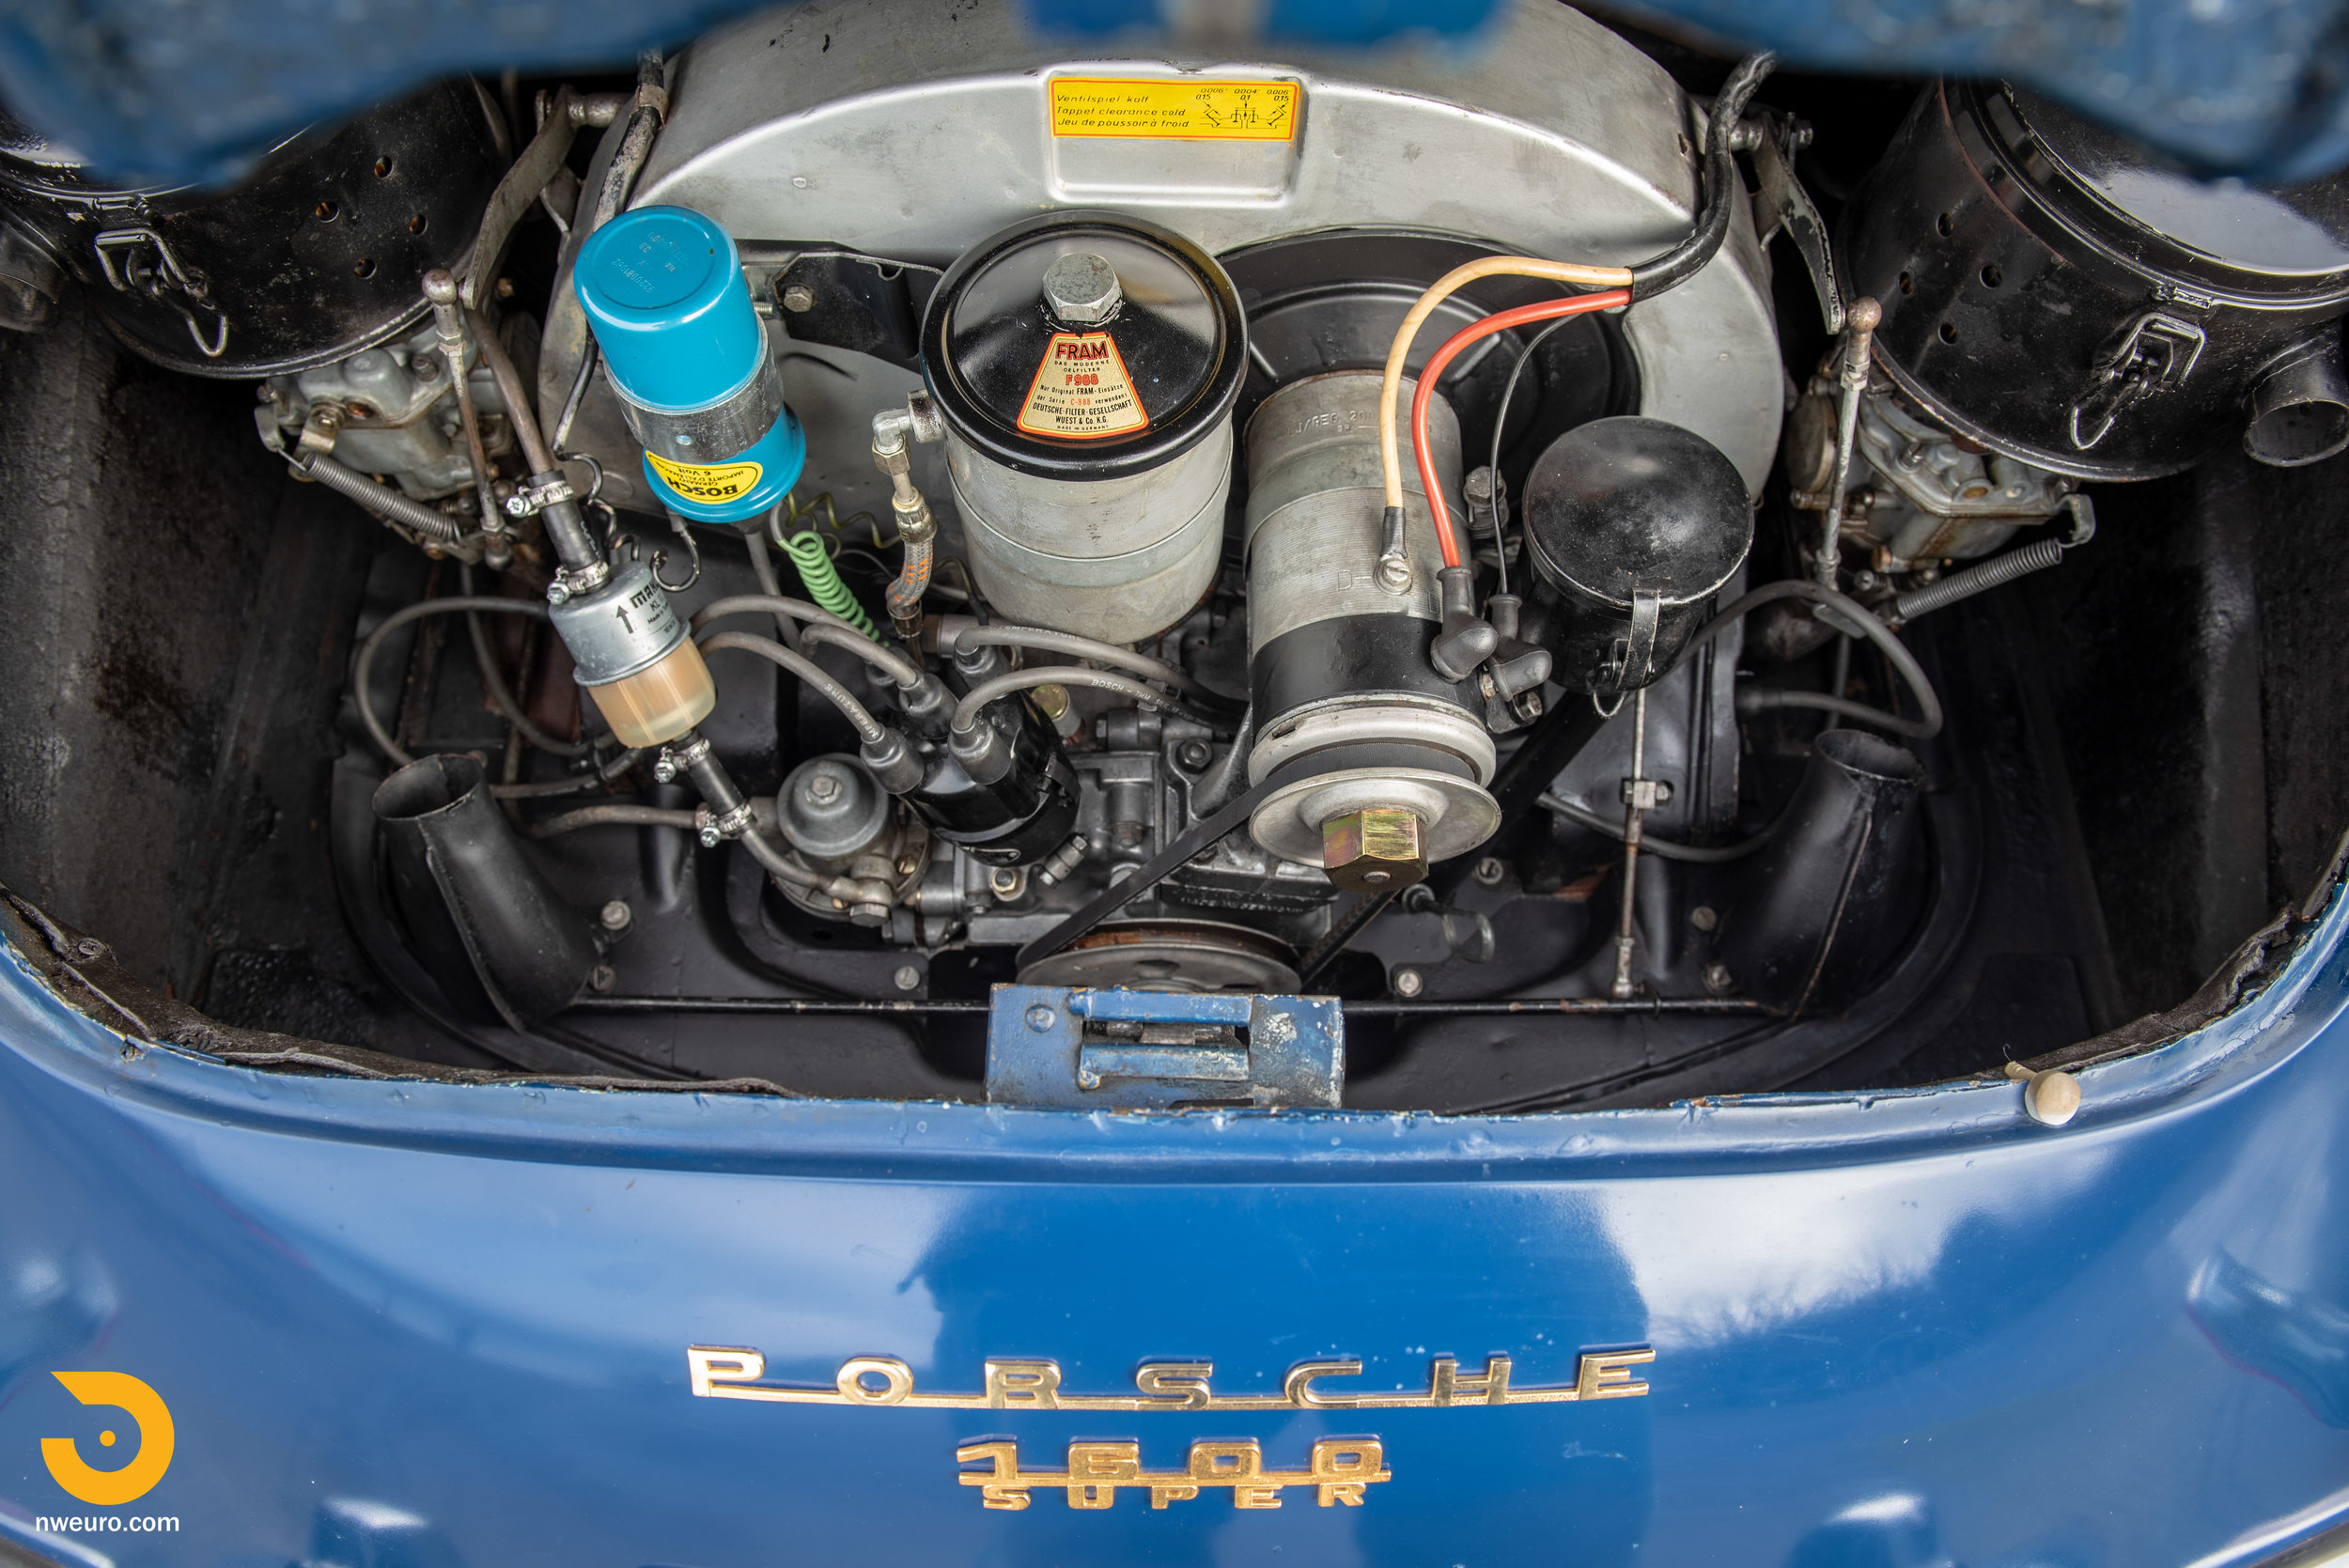 1960 Porsche 356 Hardtop Cab 1600 Super-55.jpg